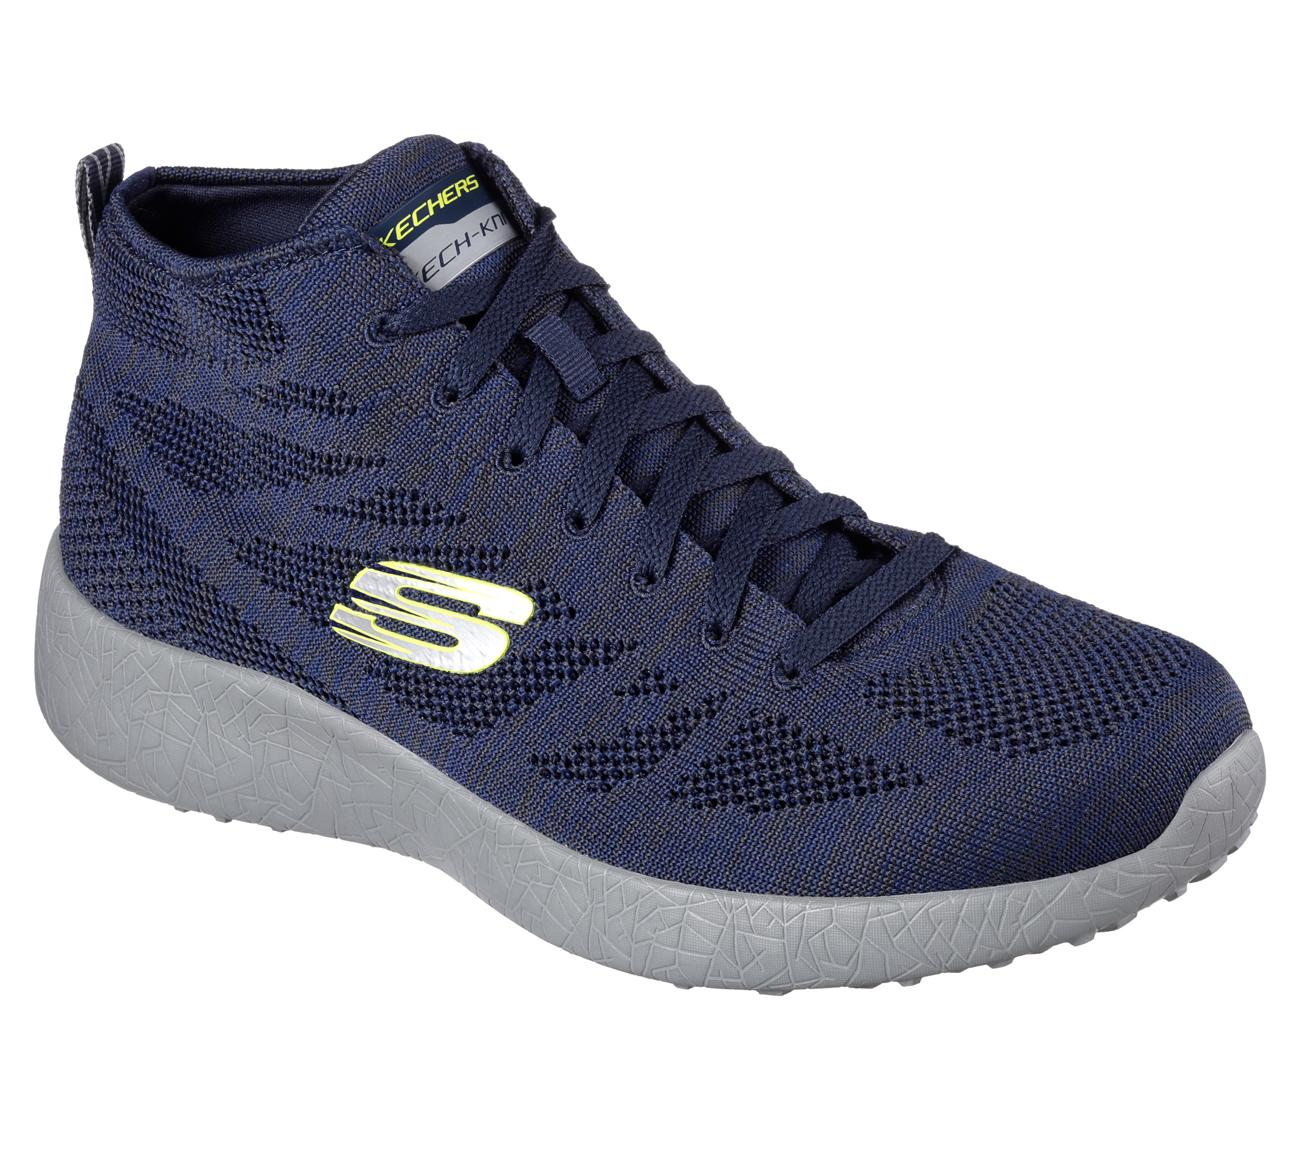 Skechers High Top Sneakers 28 Images Skechers